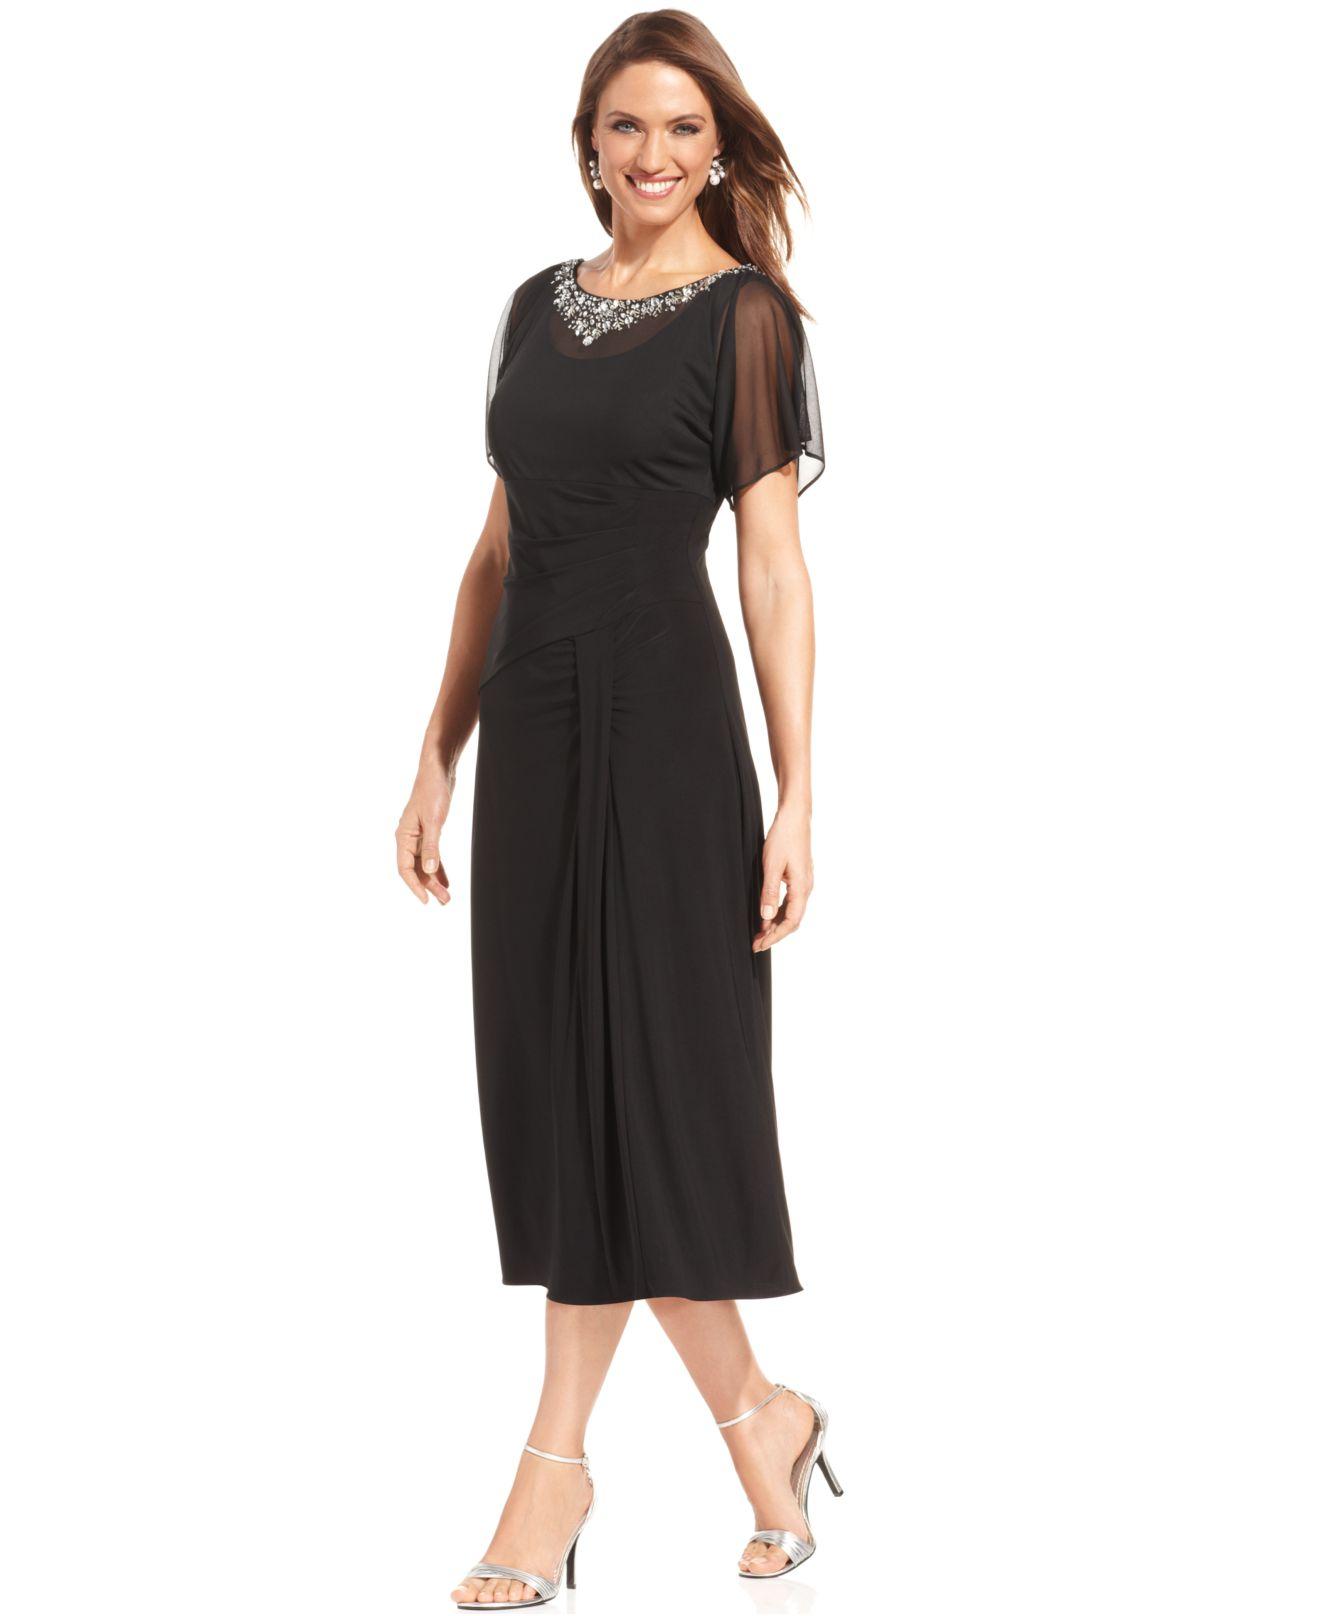 acb70d01a6c Lyst - Alex Evenings Petite Flutter-Sleeve Embellished Dress in Black